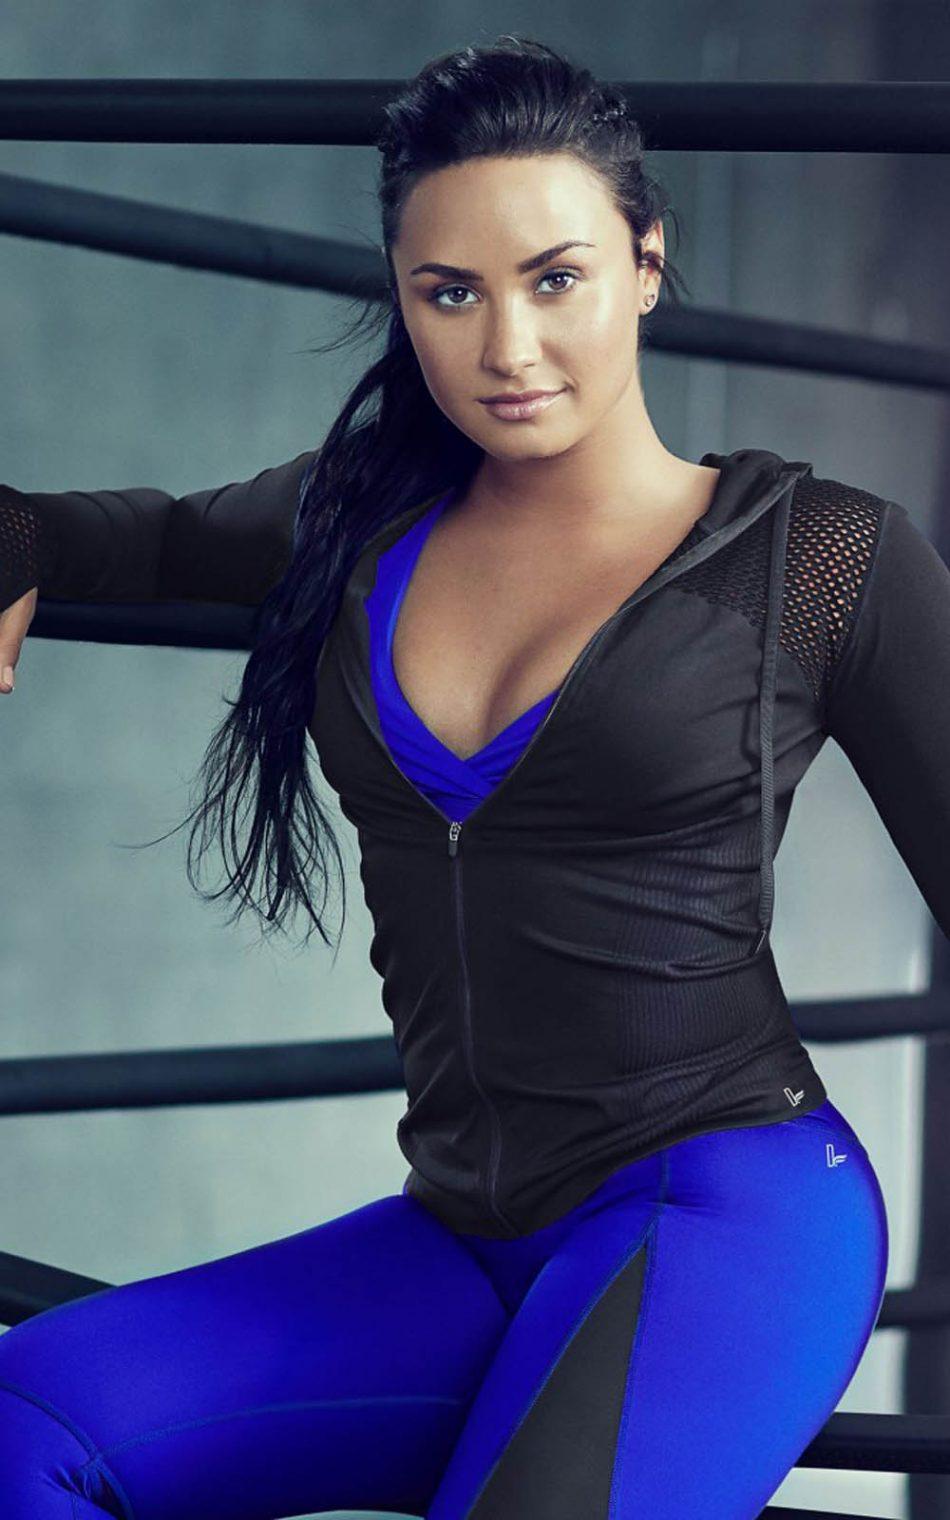 Dj Movie Hd Wallpaper Download Demi Lovato Workout Photoshoot 2017 Free Pure 4k